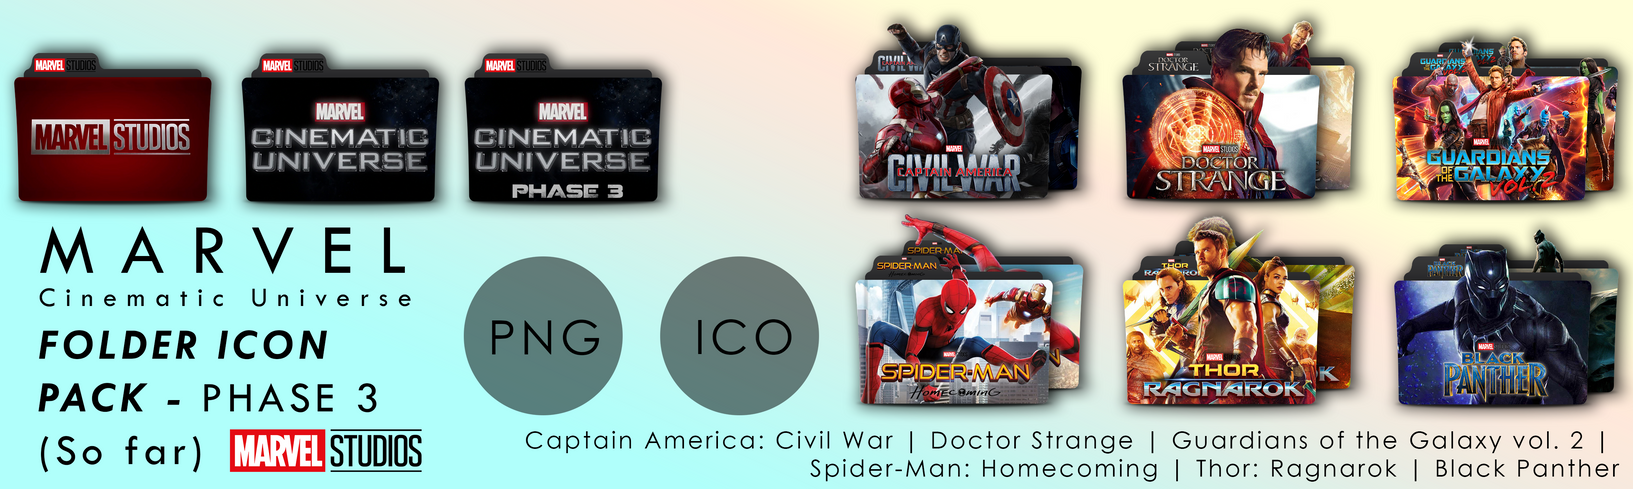 Marvel Movies Folder Icon